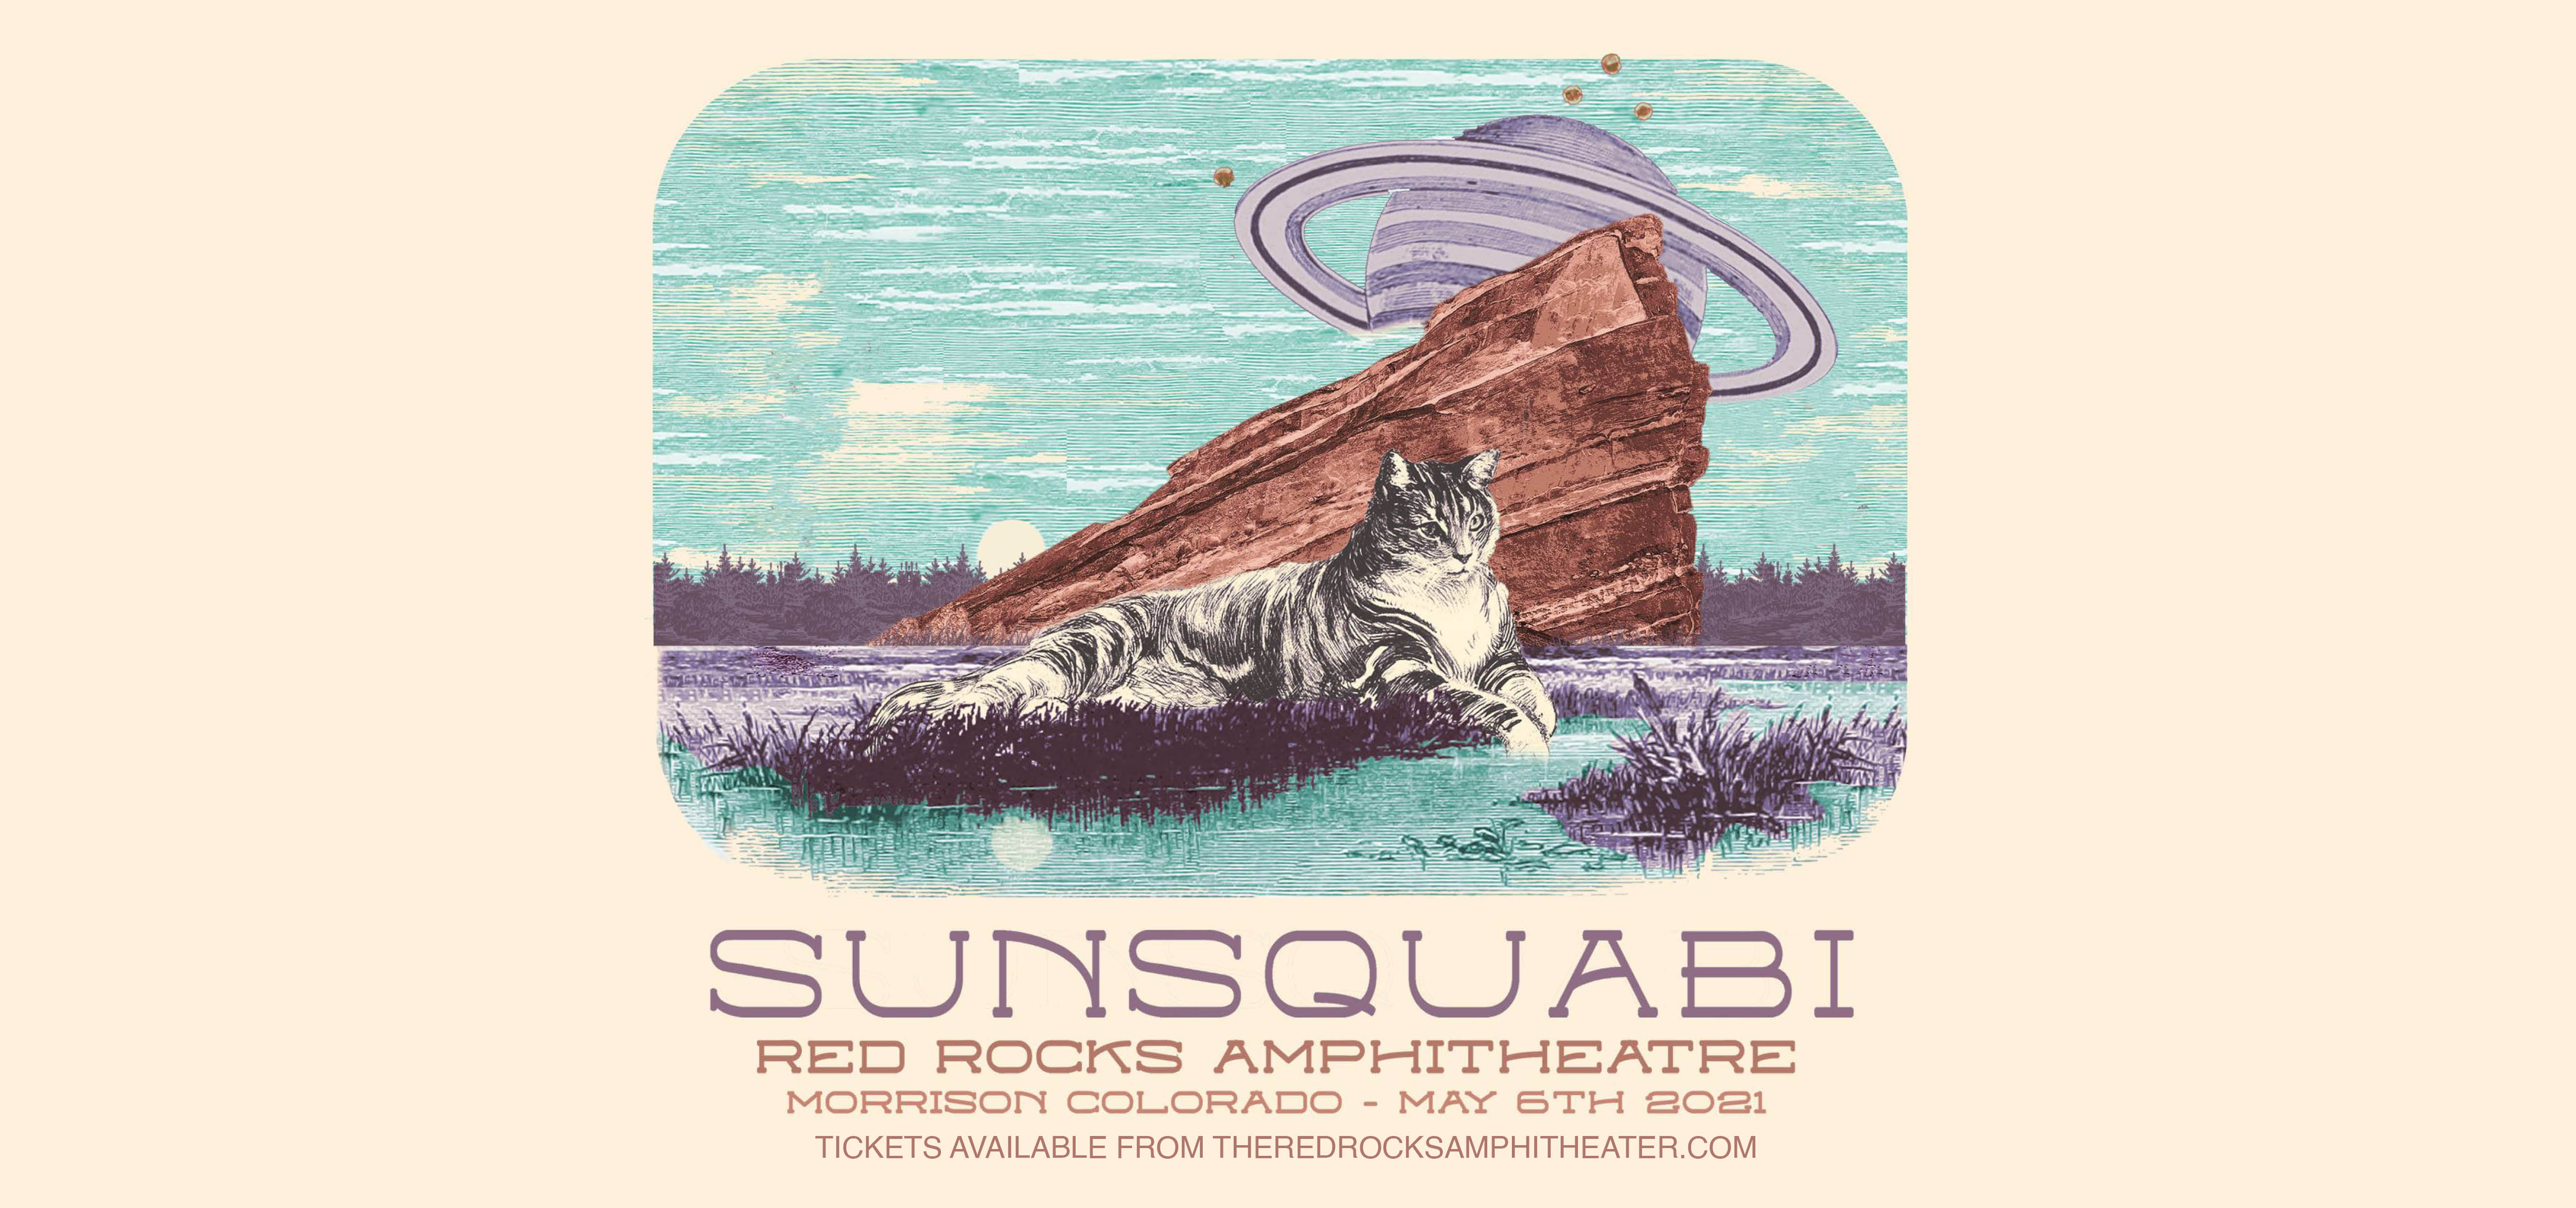 SunSquabi at Red Rocks Amphitheater